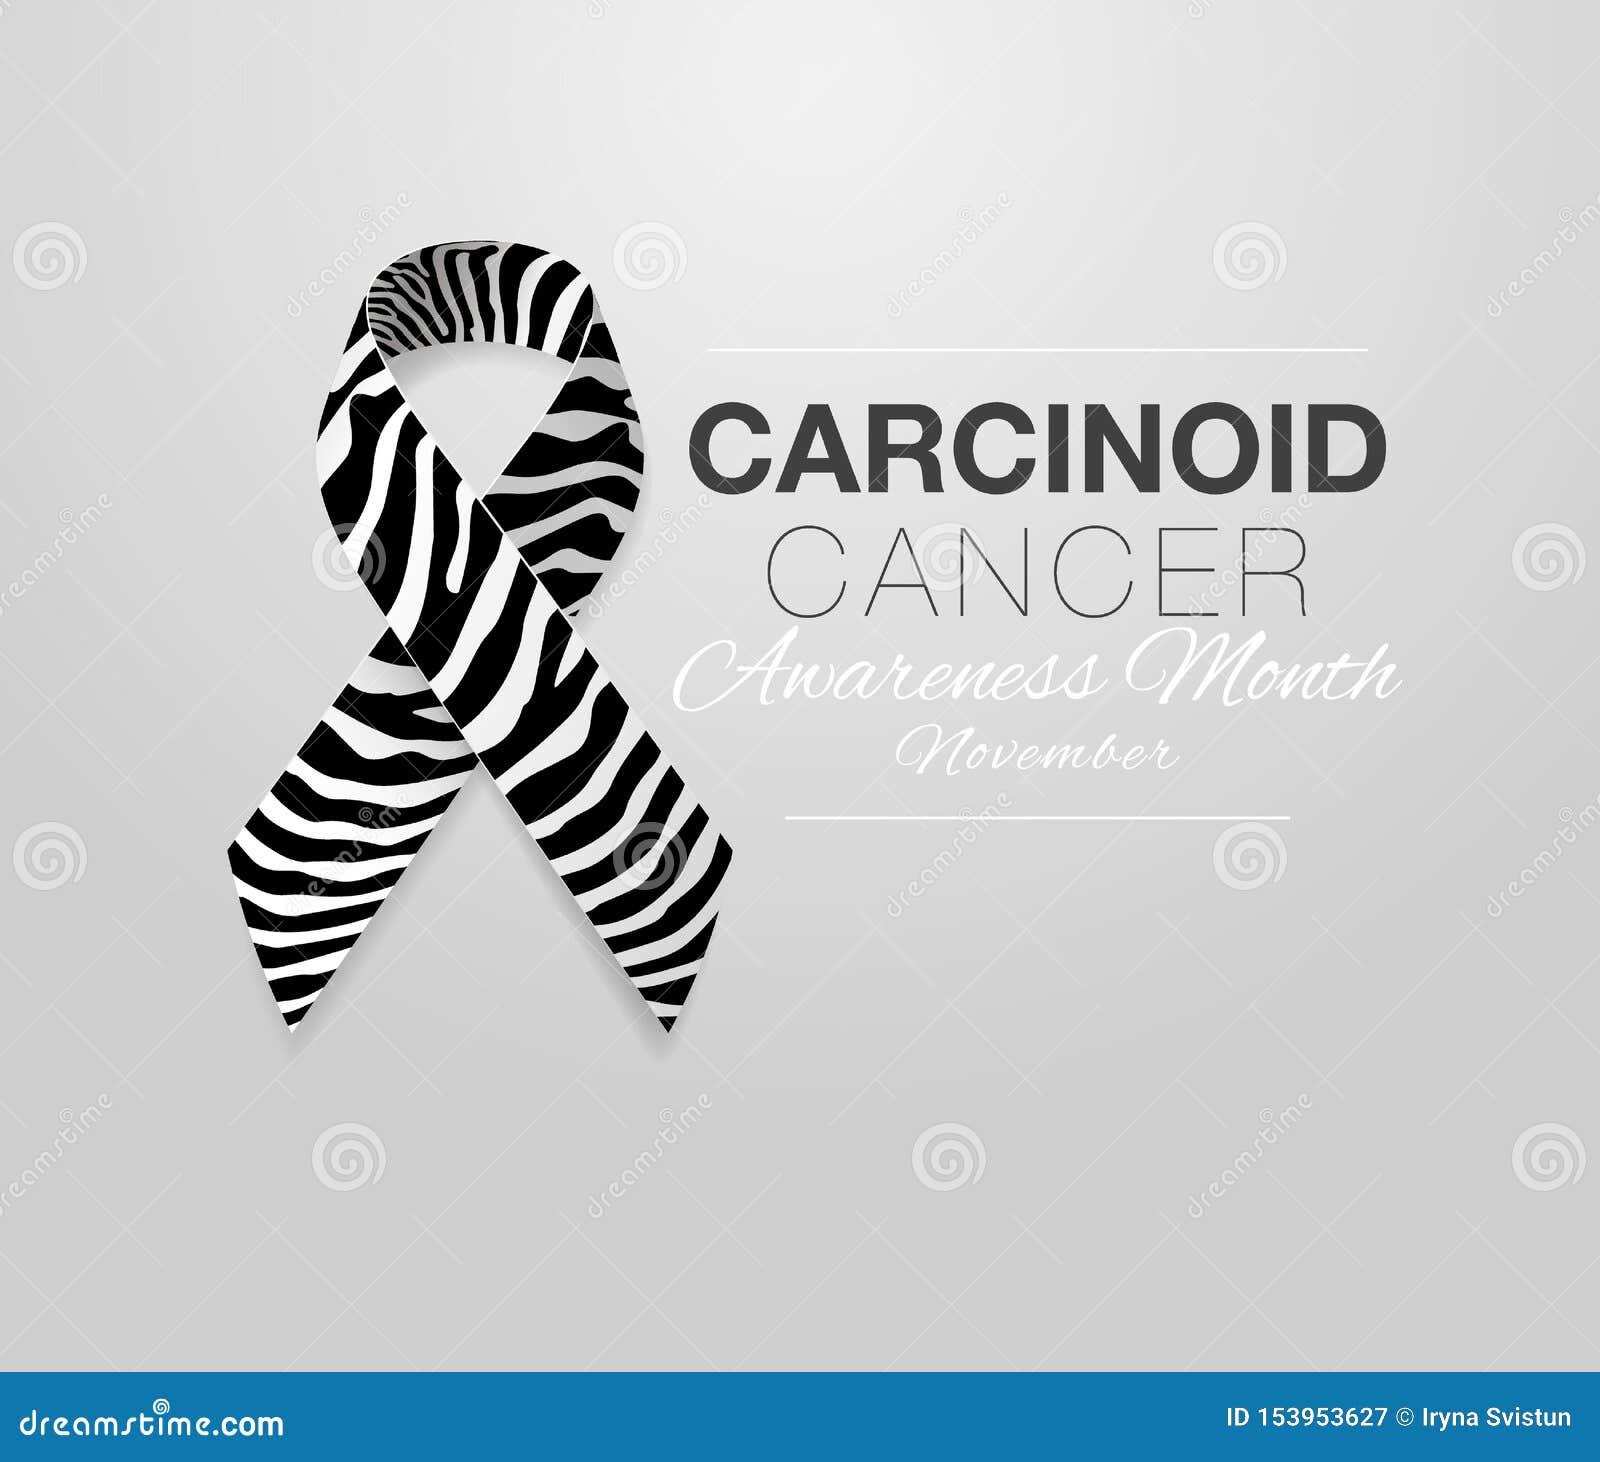 neuroendocrine cancer awareness day)